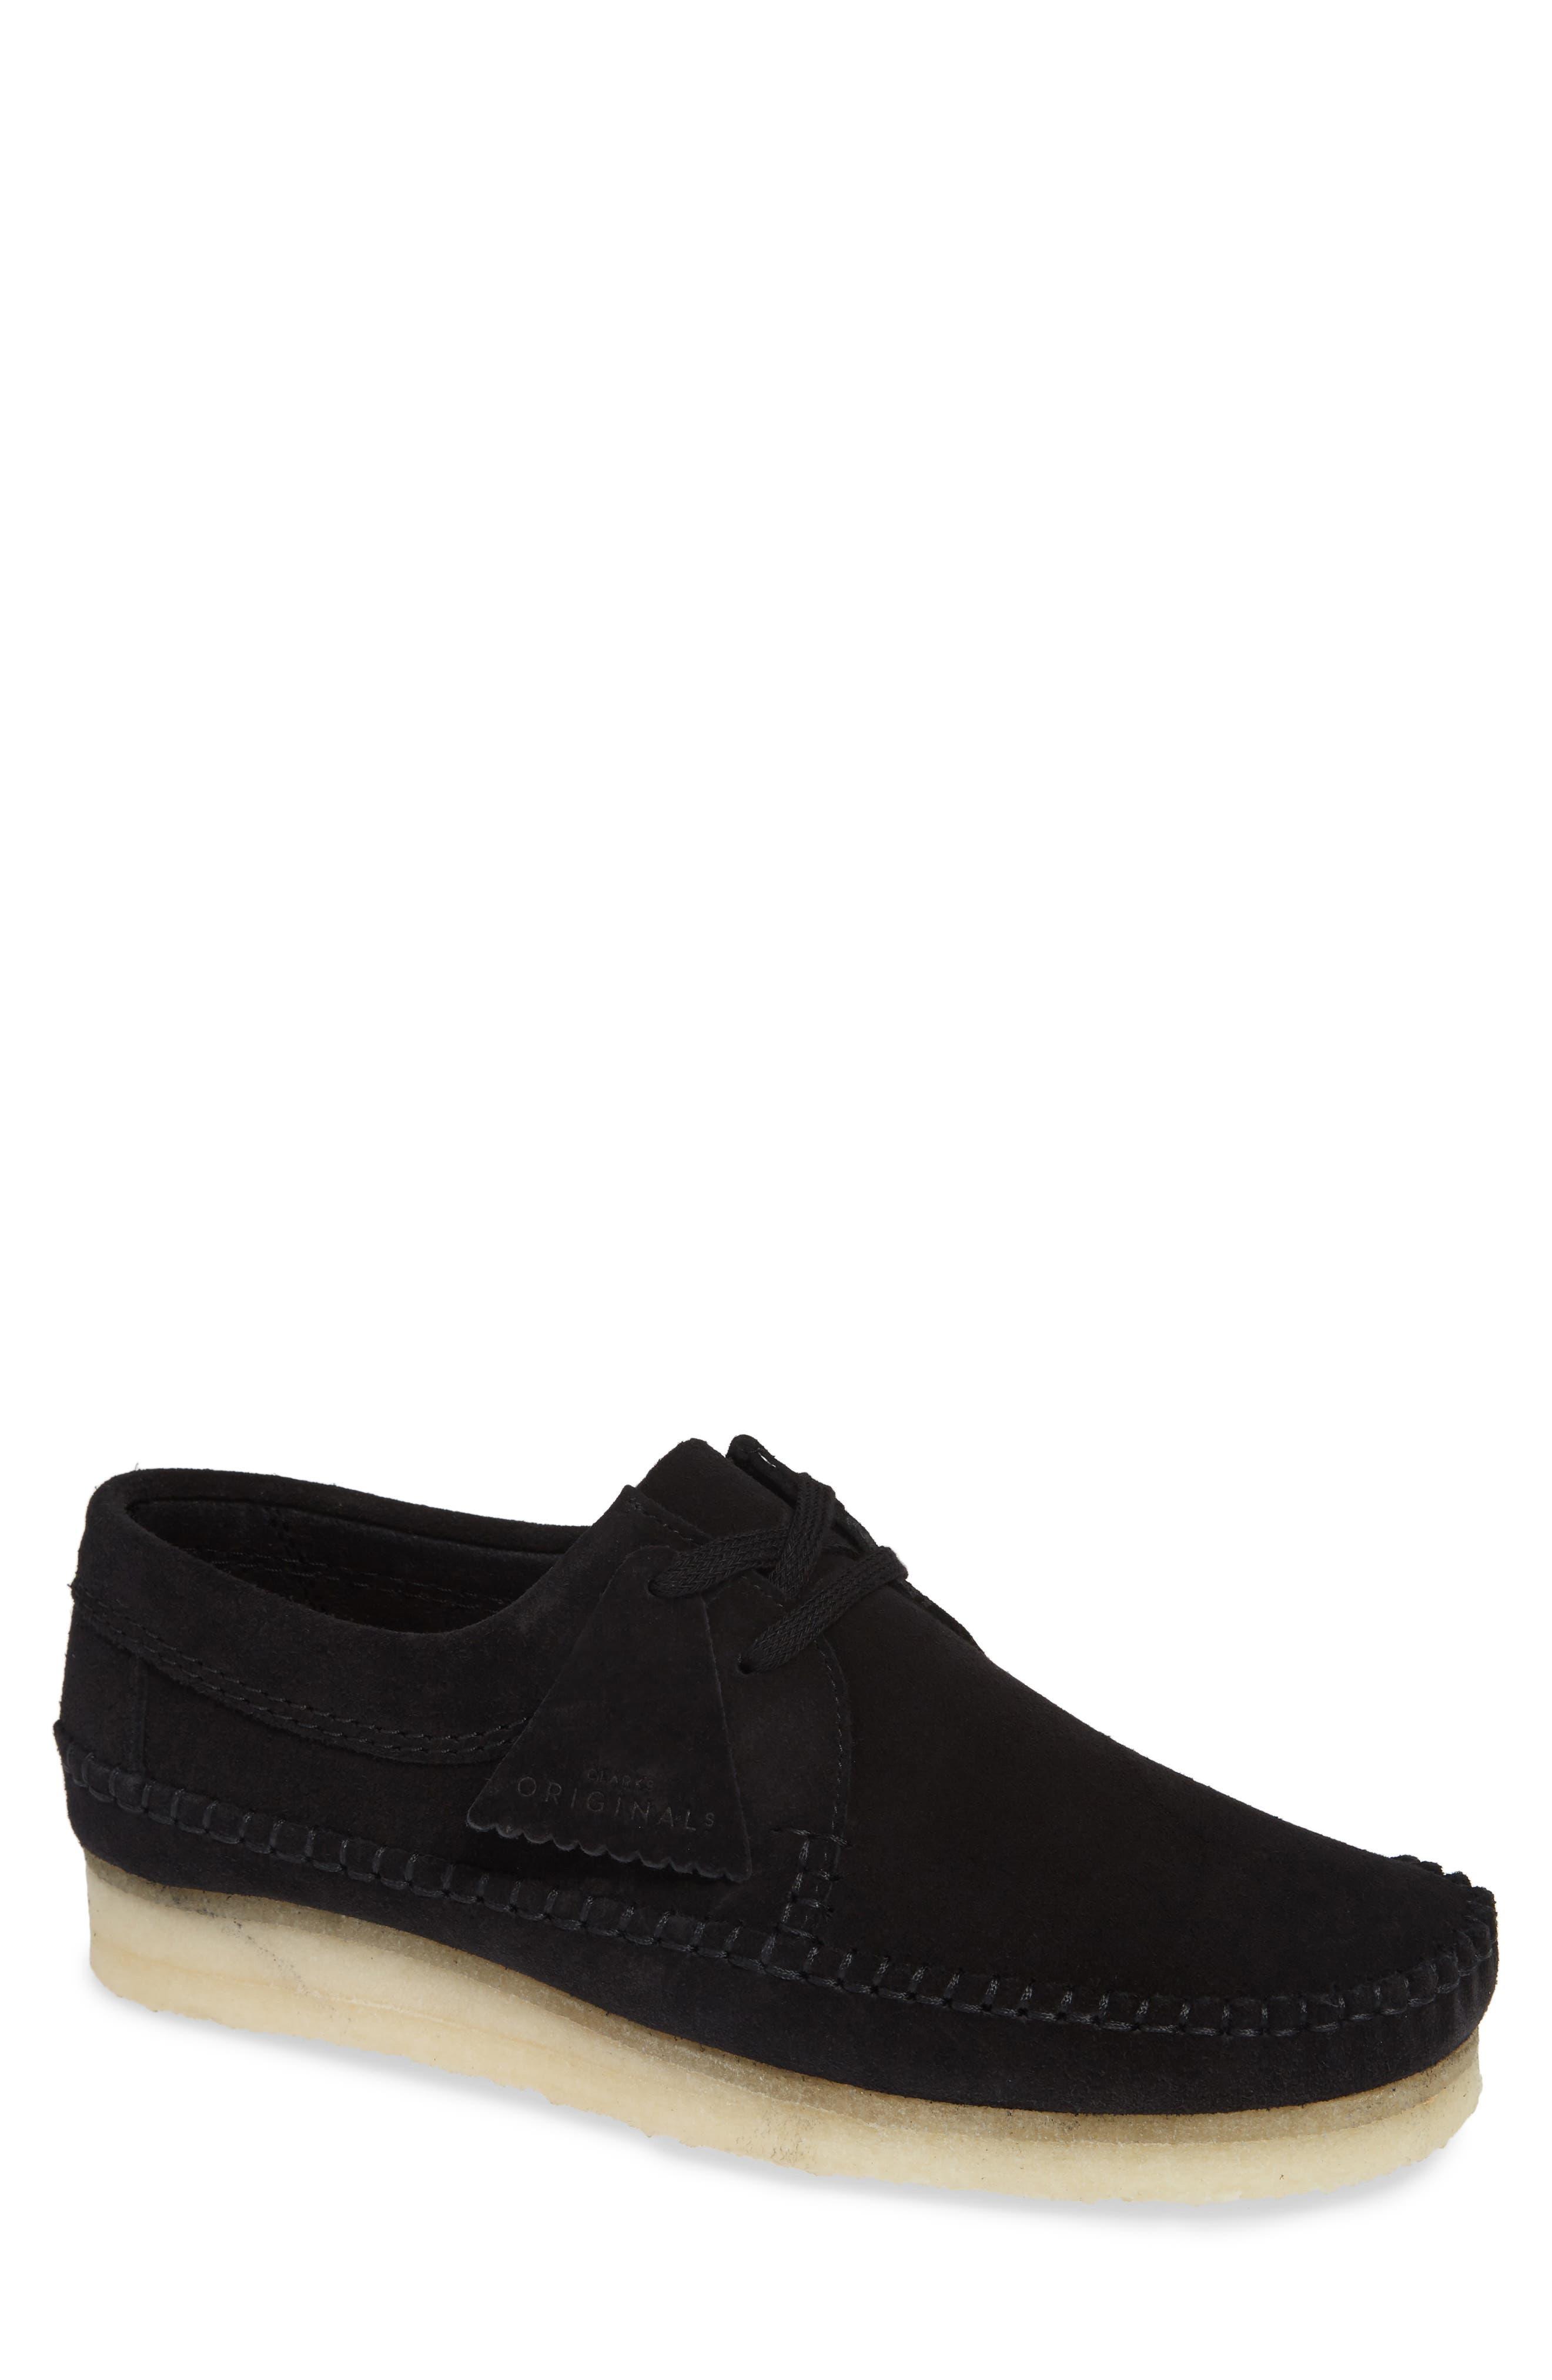 CLARKS<SUP>®</SUP> 'Weaver' Moc Toe Derby, Main, color, BLACK SUEDE